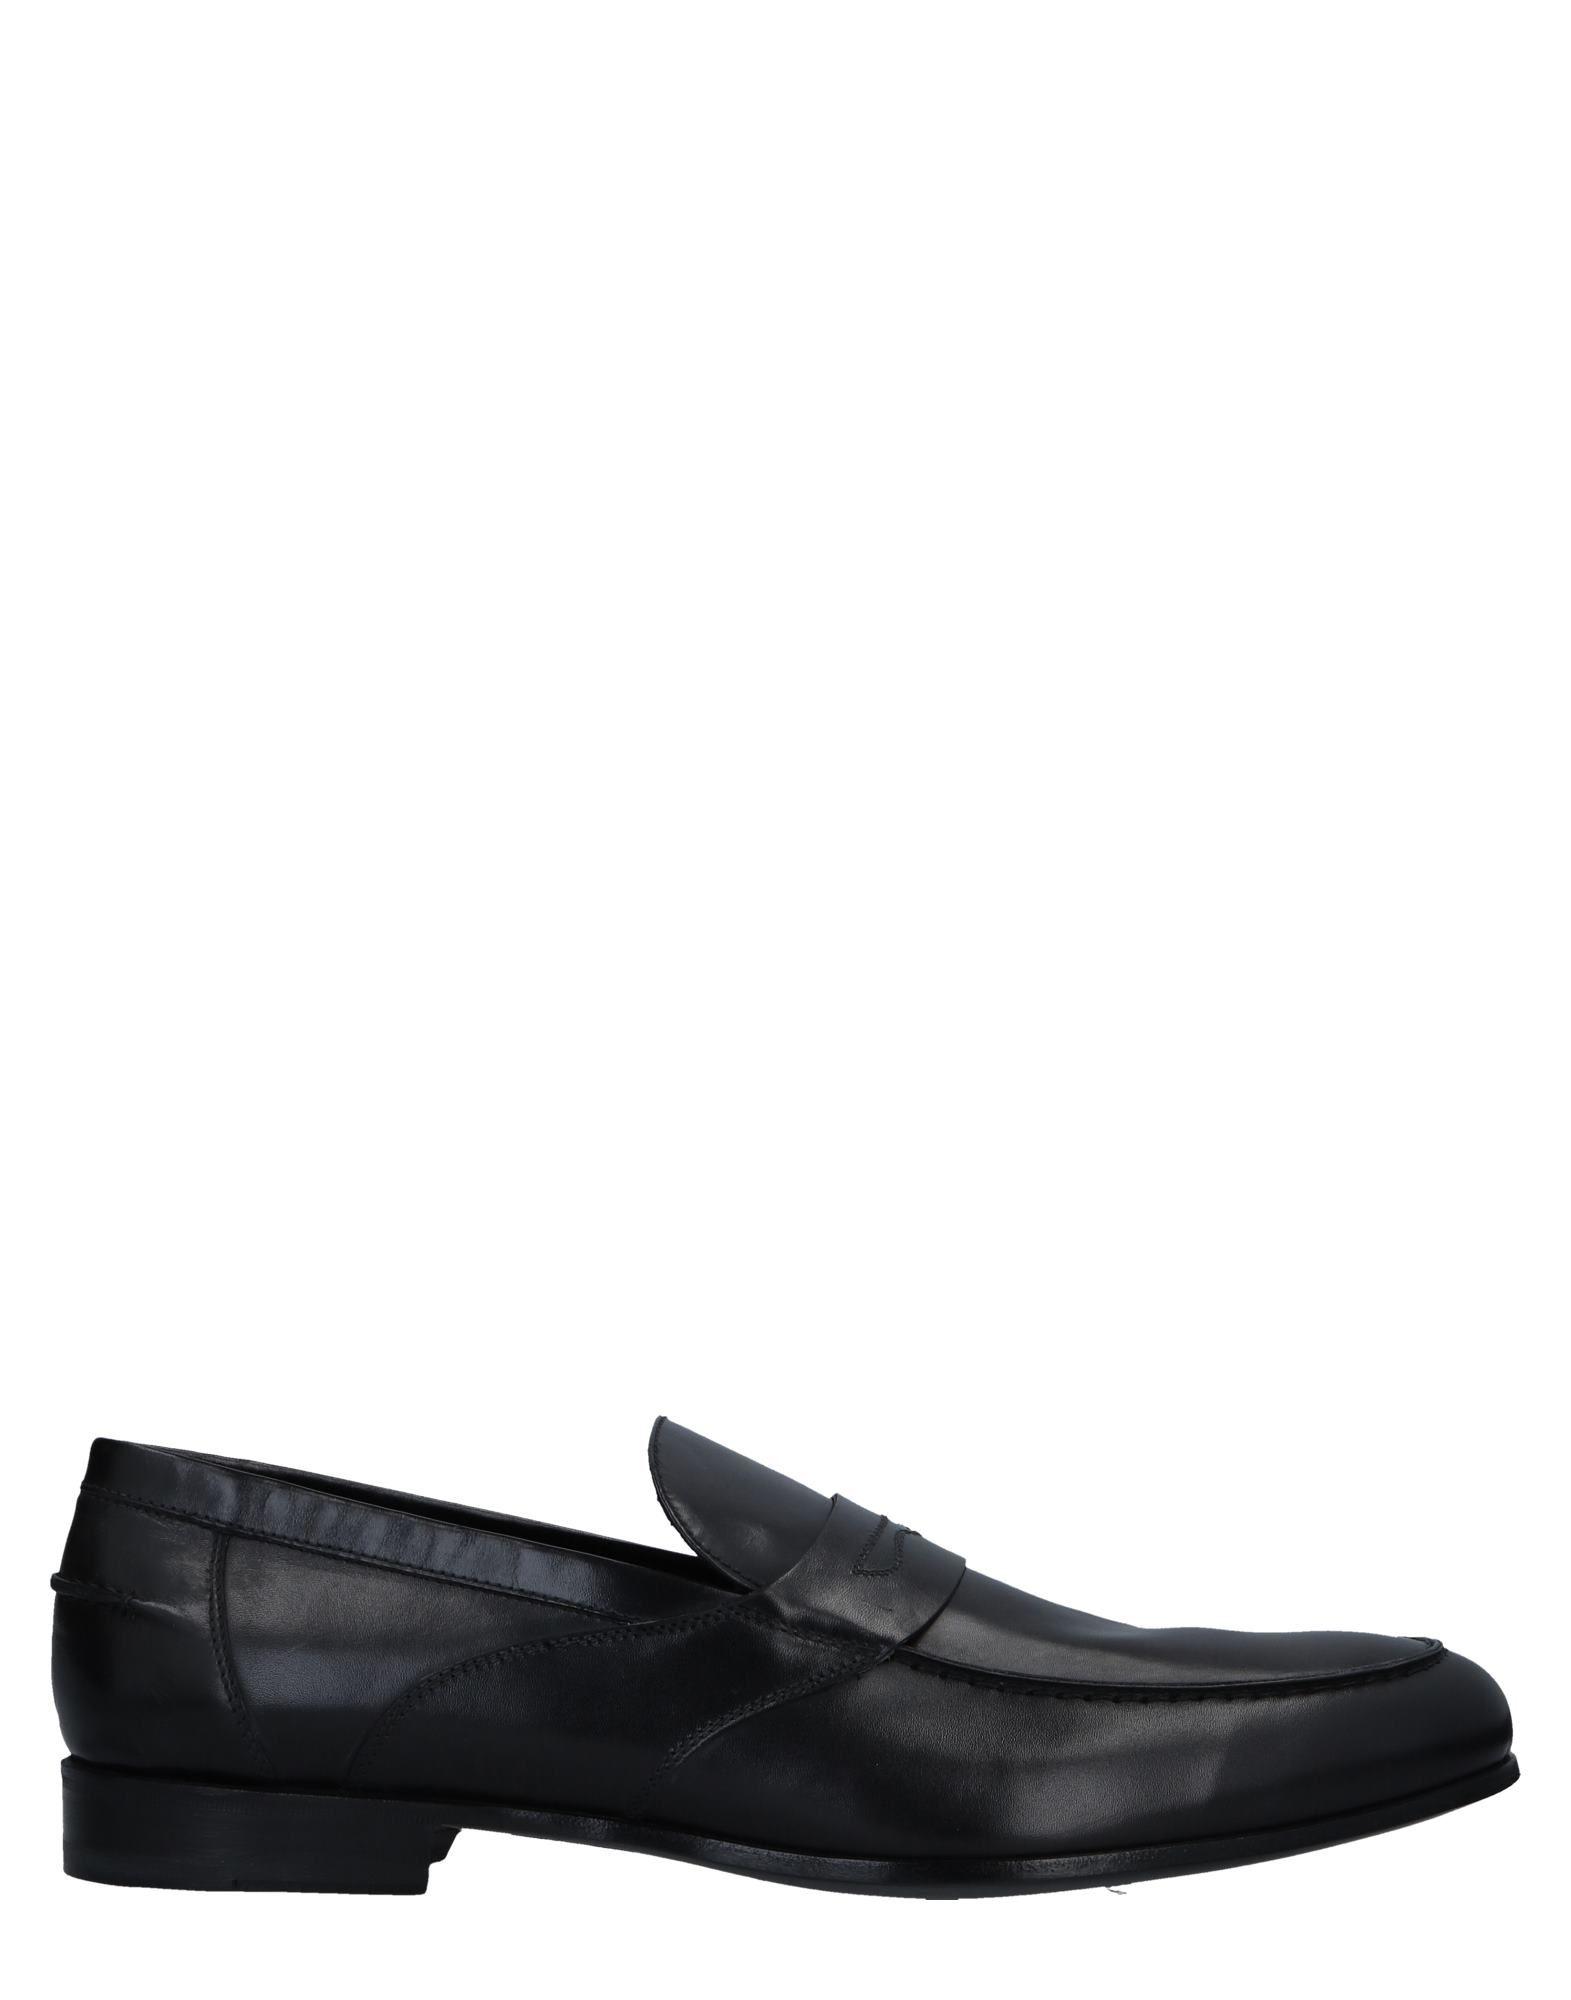 Günstige und modische Schuhe Doucal's Mokassins Herren  11520157FI